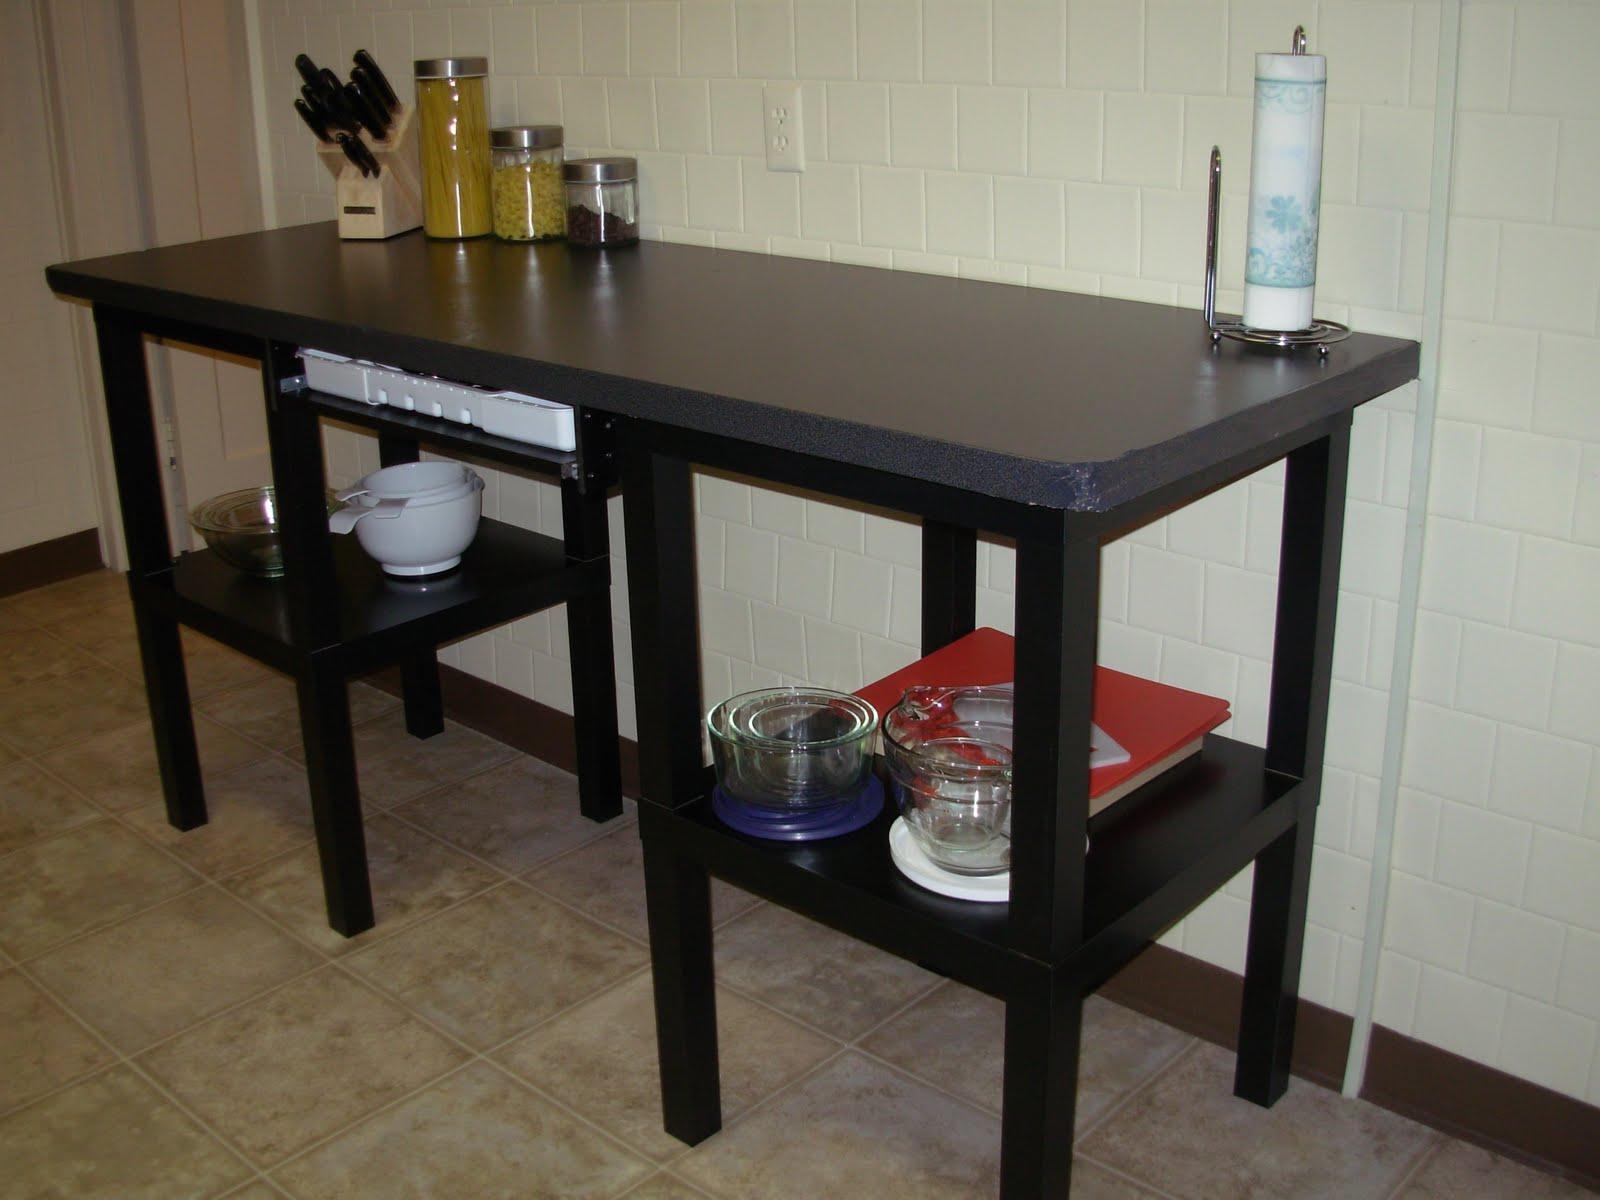 Kitchen work station ikea hackers - Kitchen work tables ikea ...